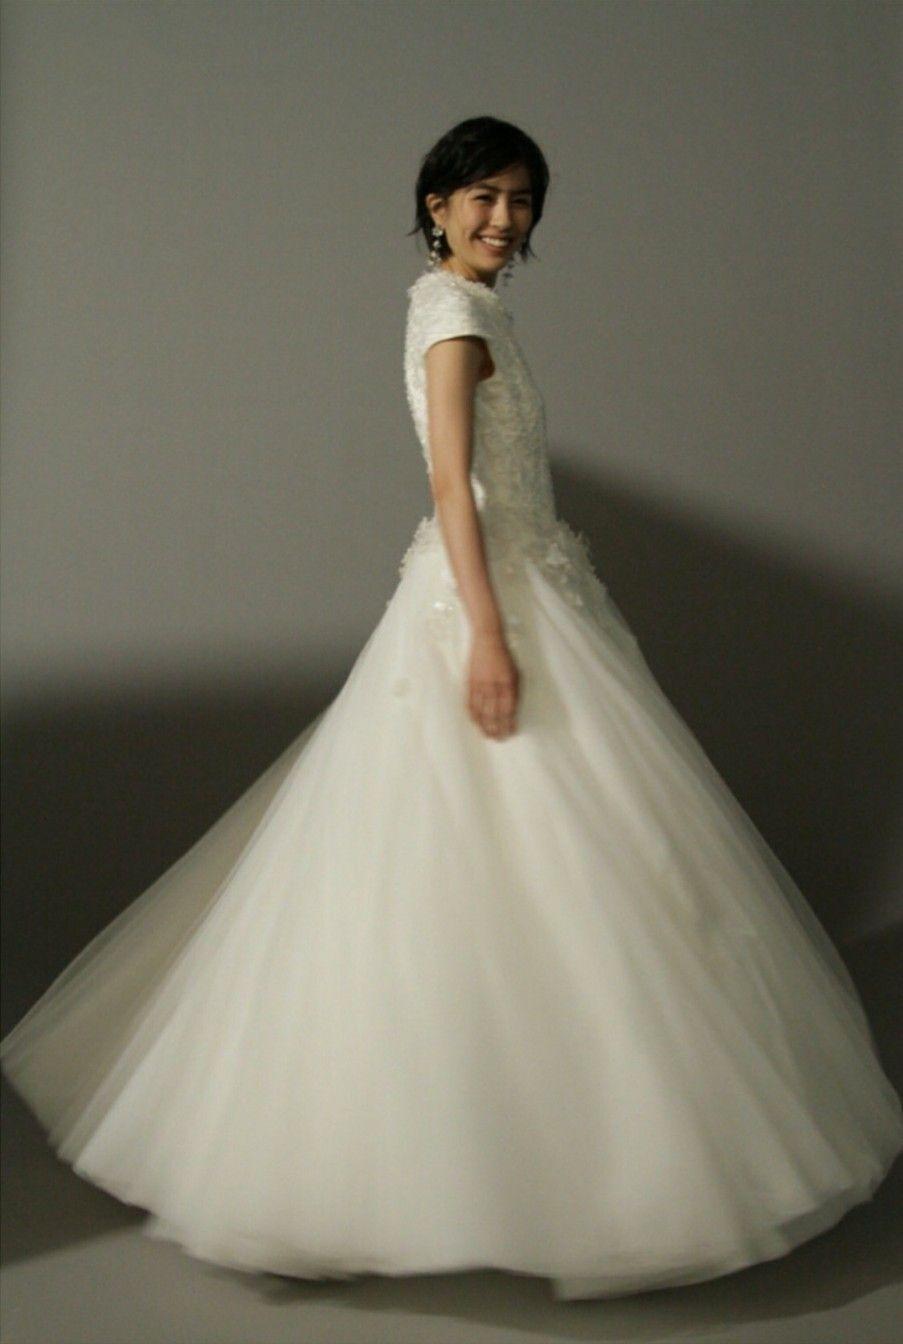 yui sakuma 佐久間由衣 ウェディングドレス ウェディング